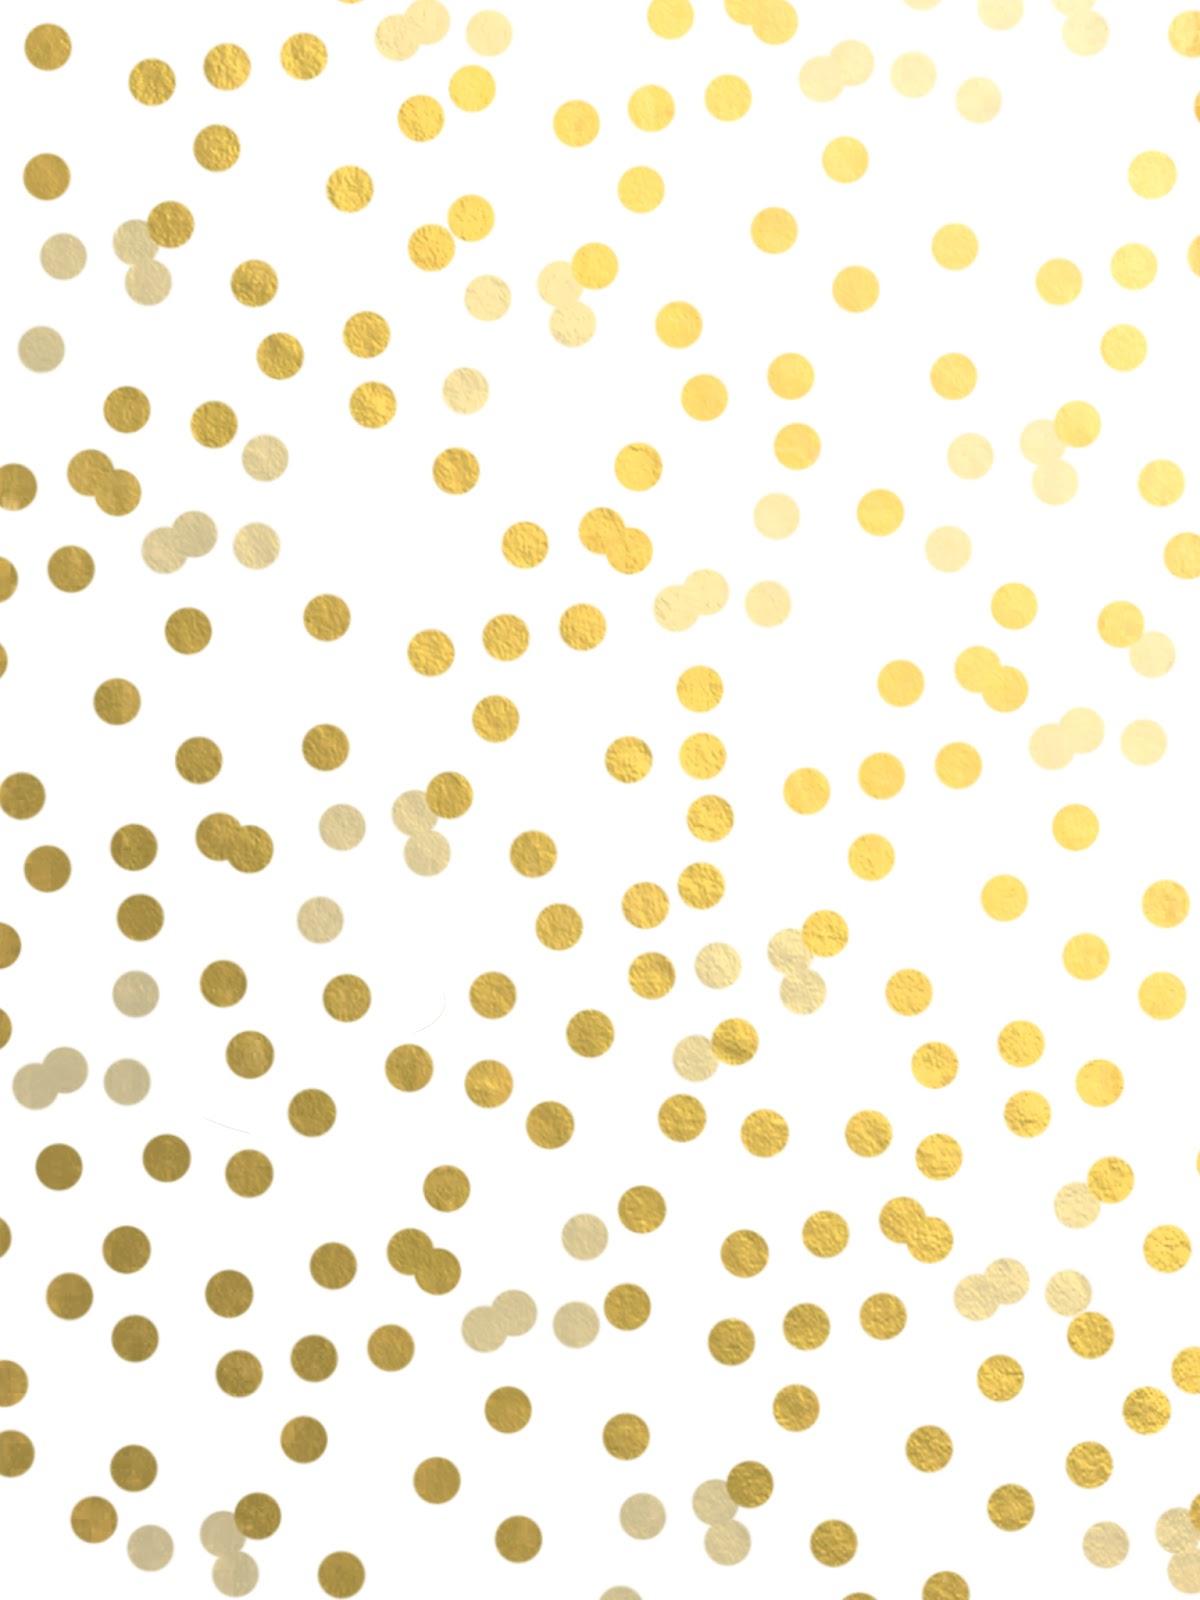 Gold Polka Dot Wallpaper Gold polka dot 1200x1600